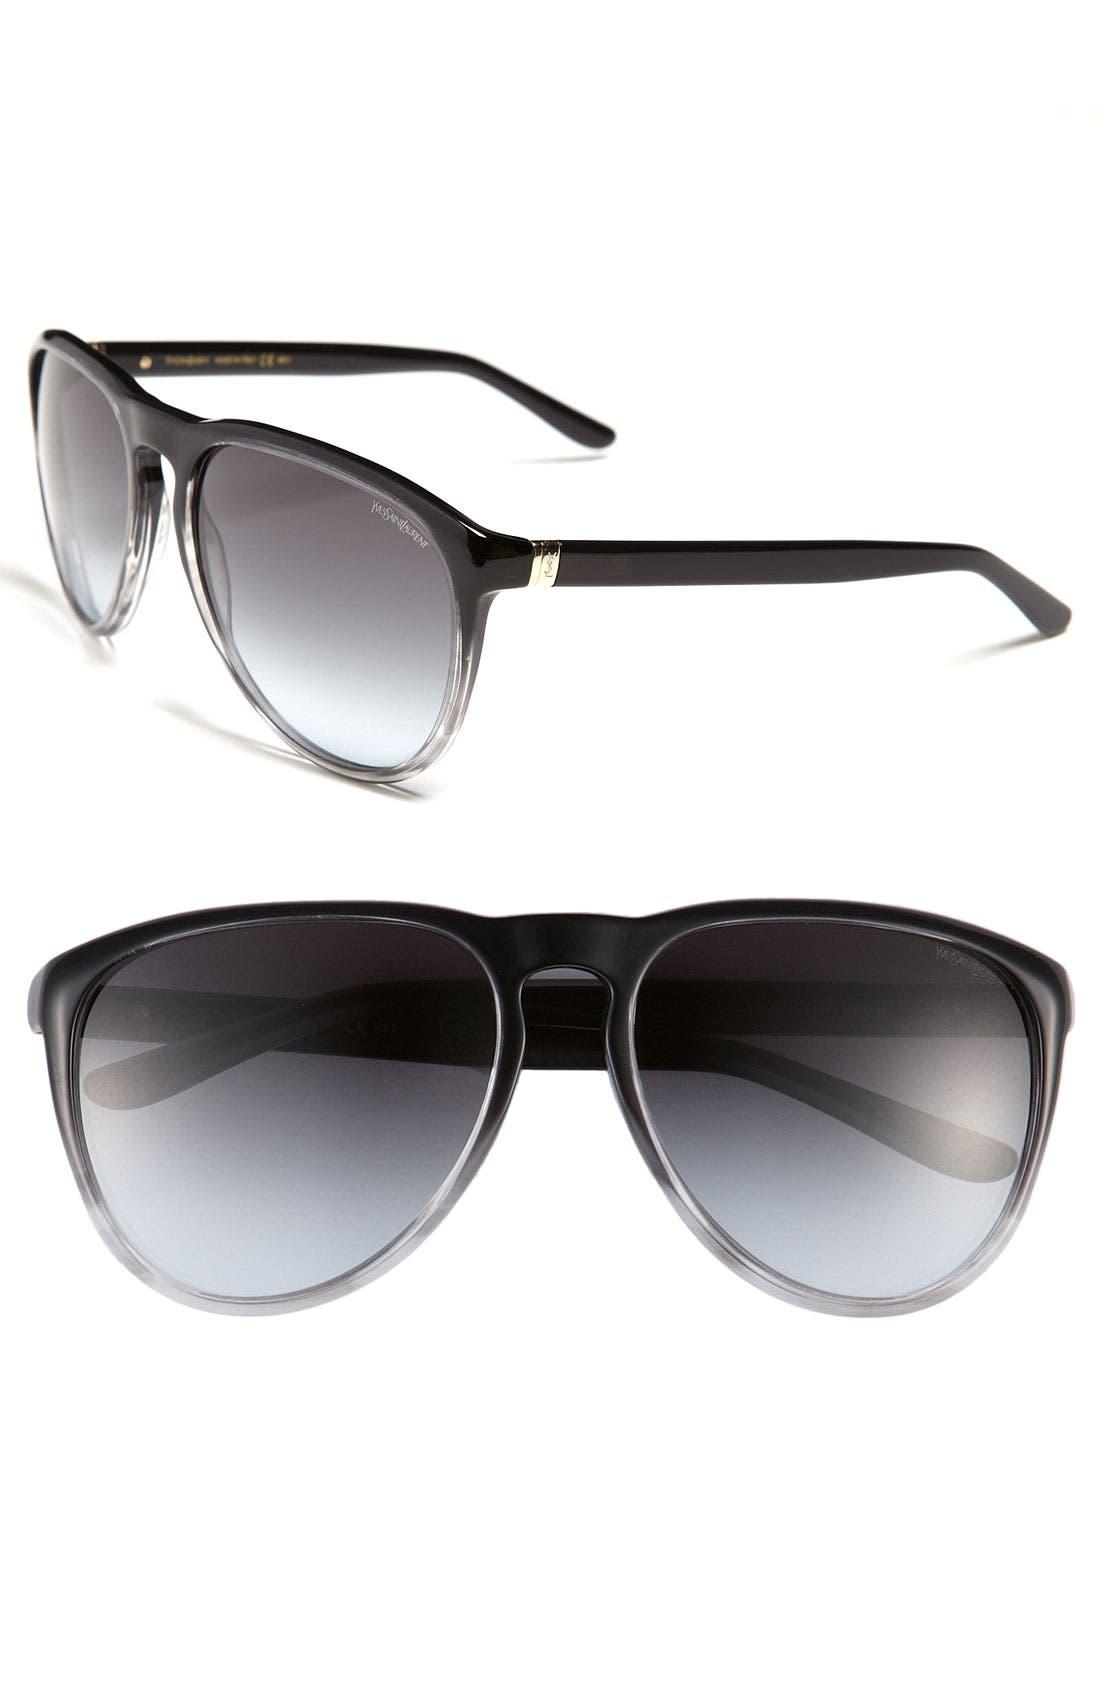 Main Image - Yves Saint Laurent Retro Sunglasses